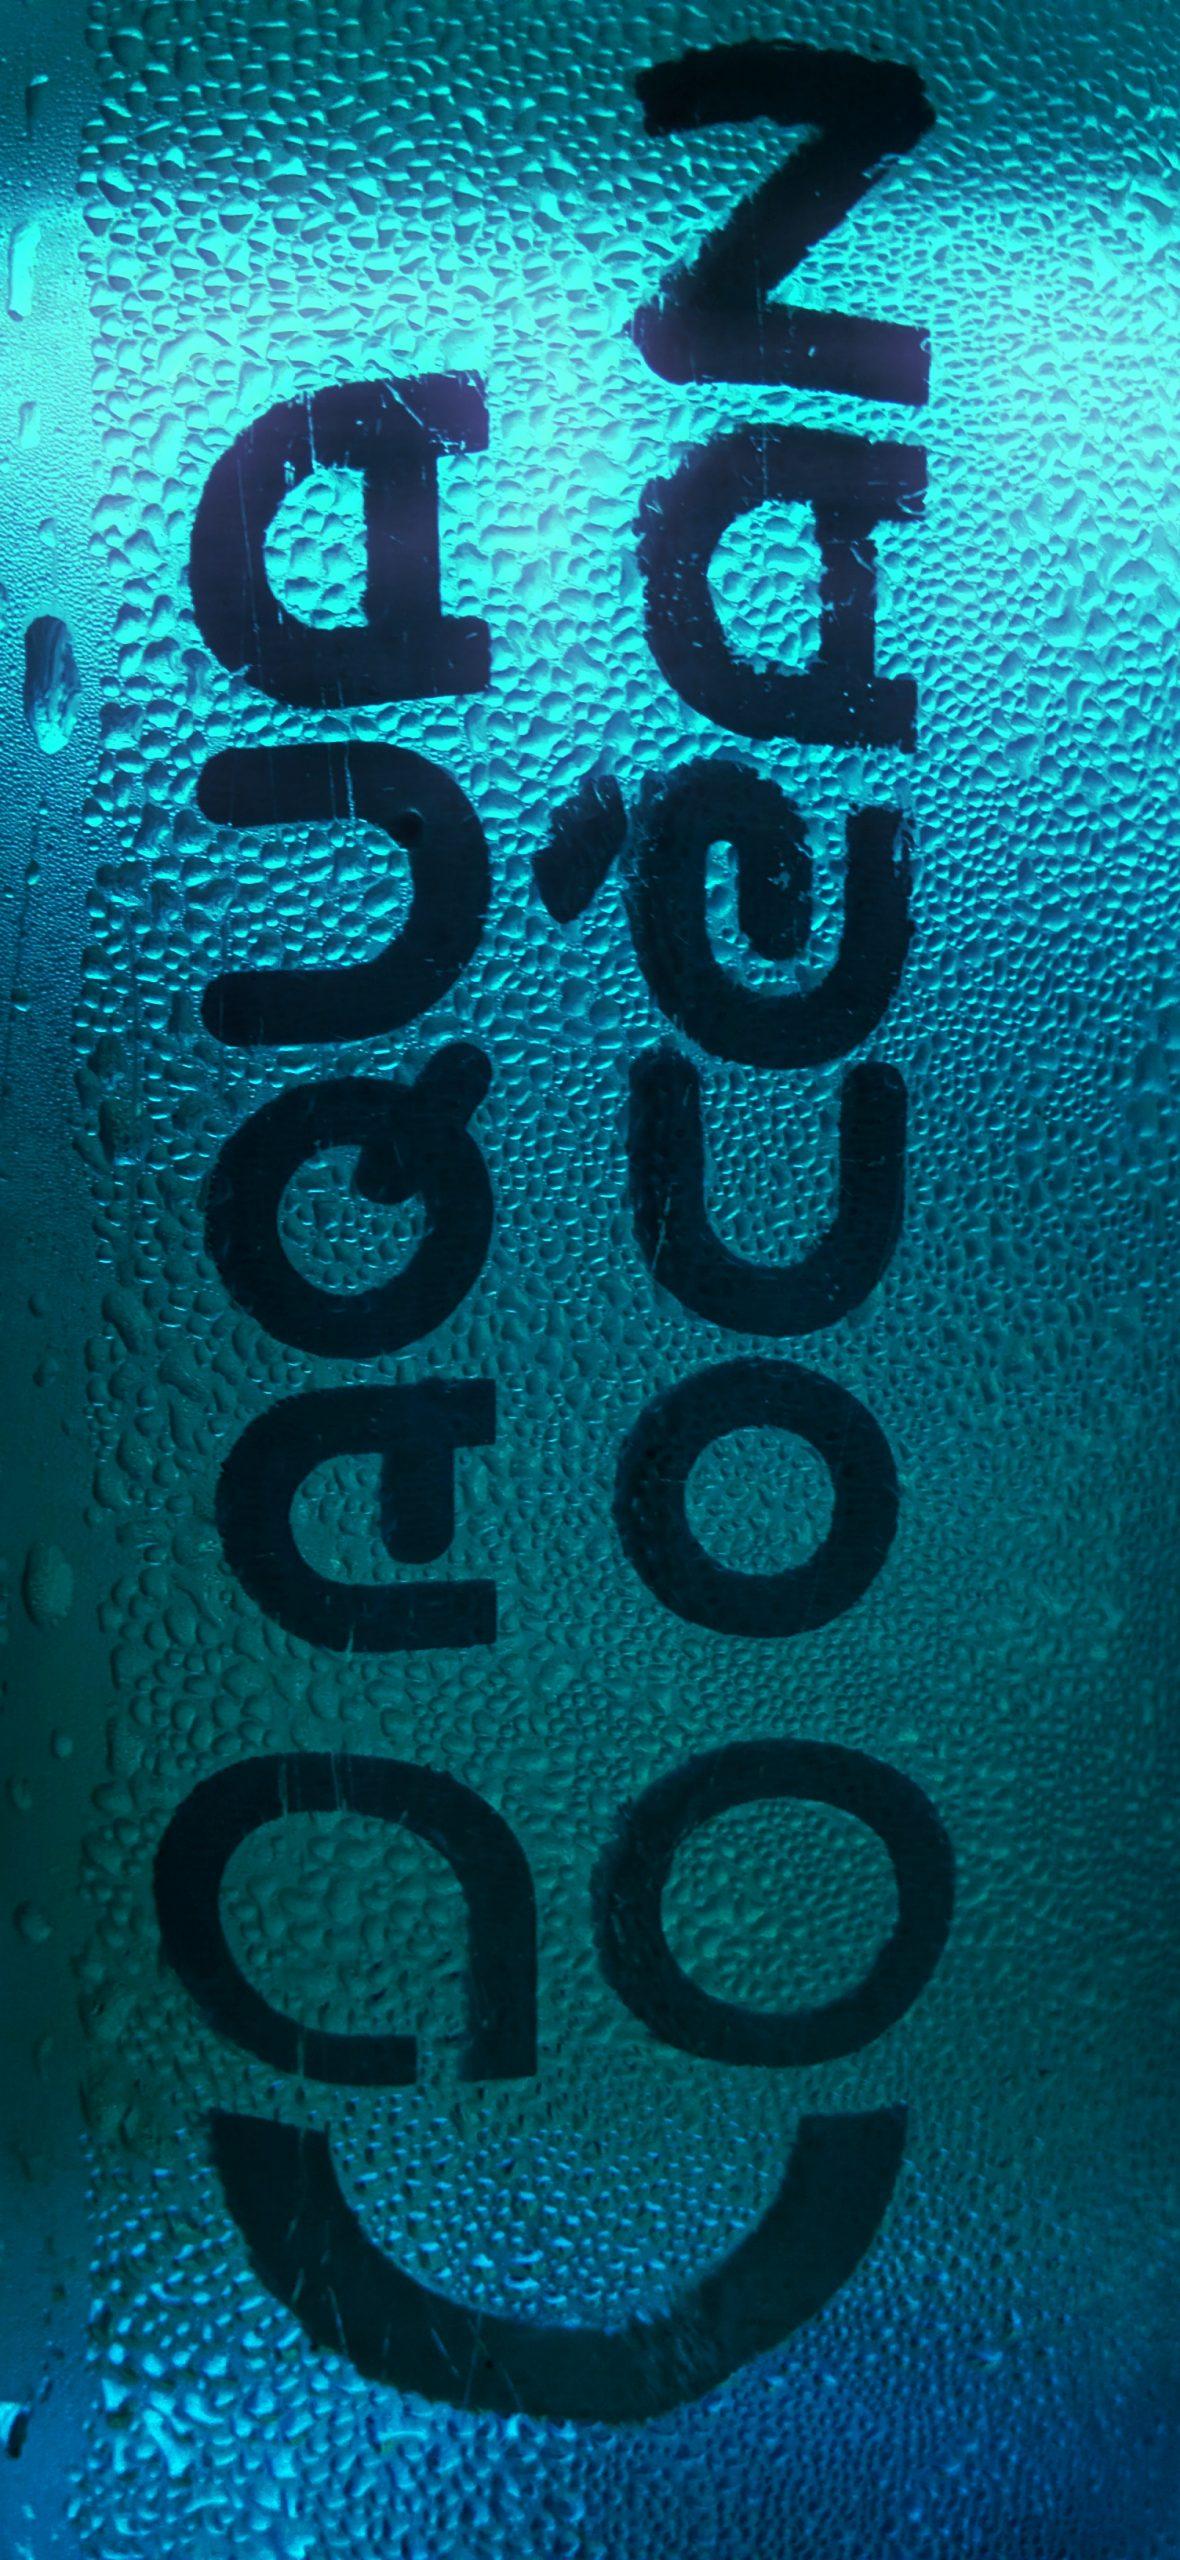 Aqua ocean written on a product